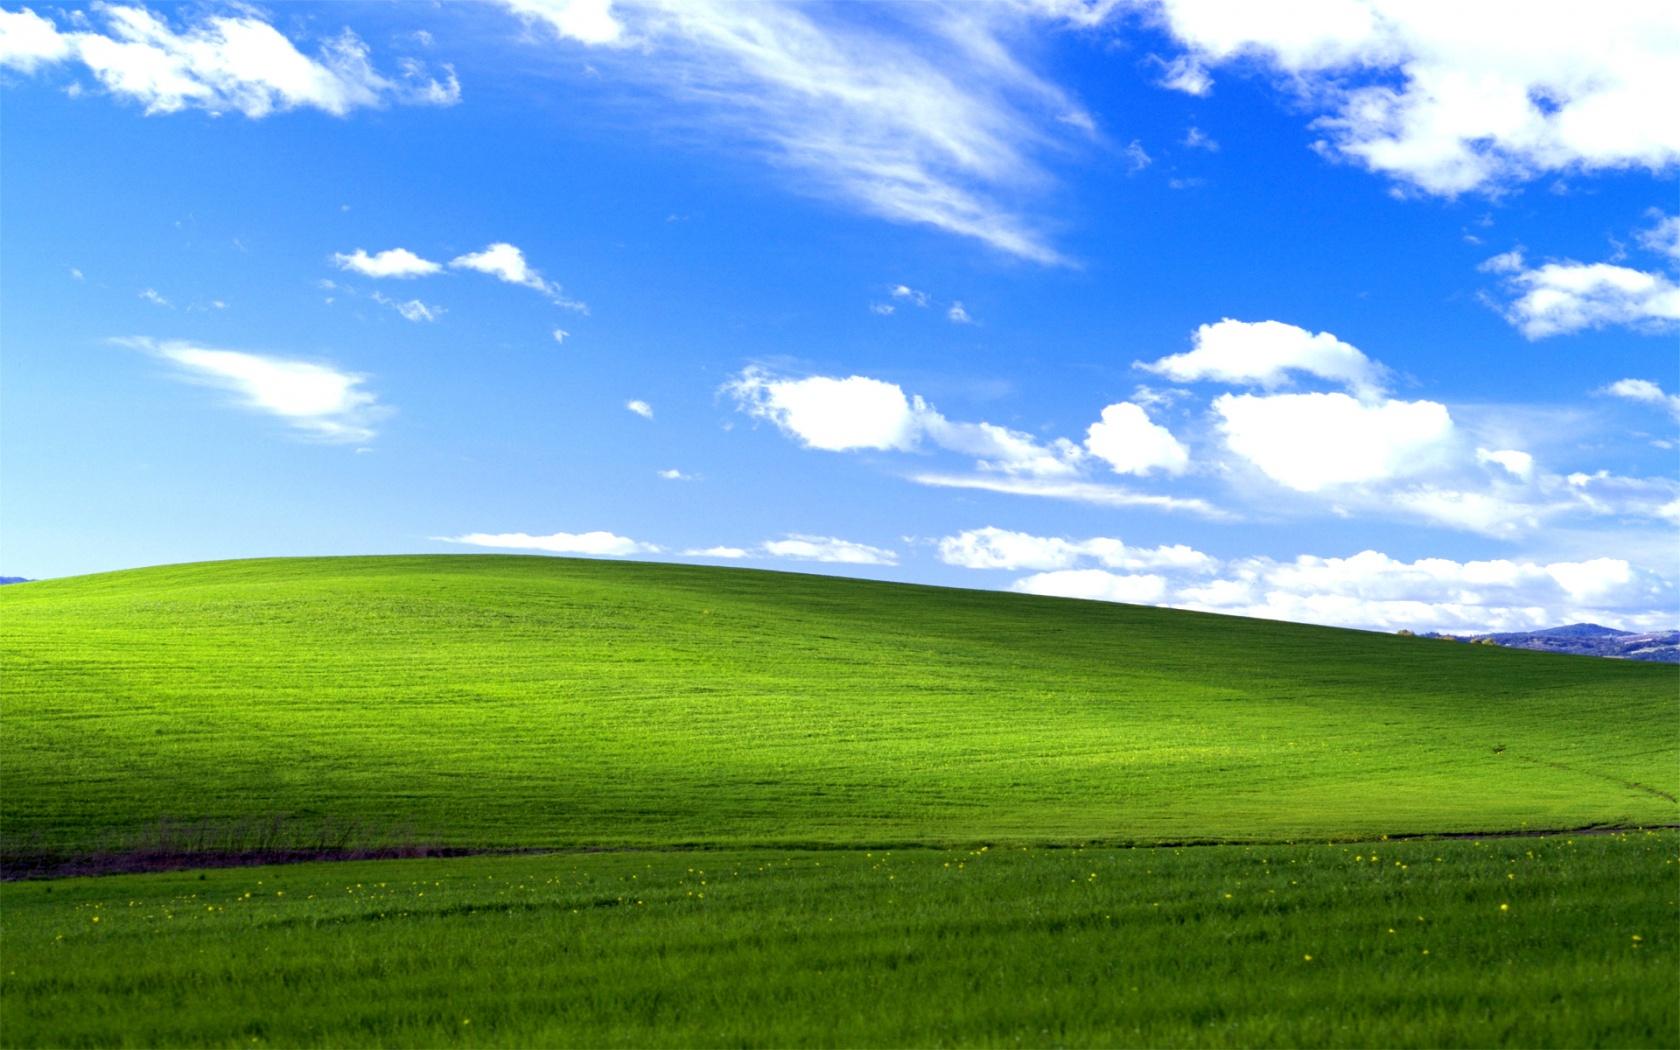 ... http://www.smscs.com/photo/wallpaper_desktop_1680x1050_windows_xp.html